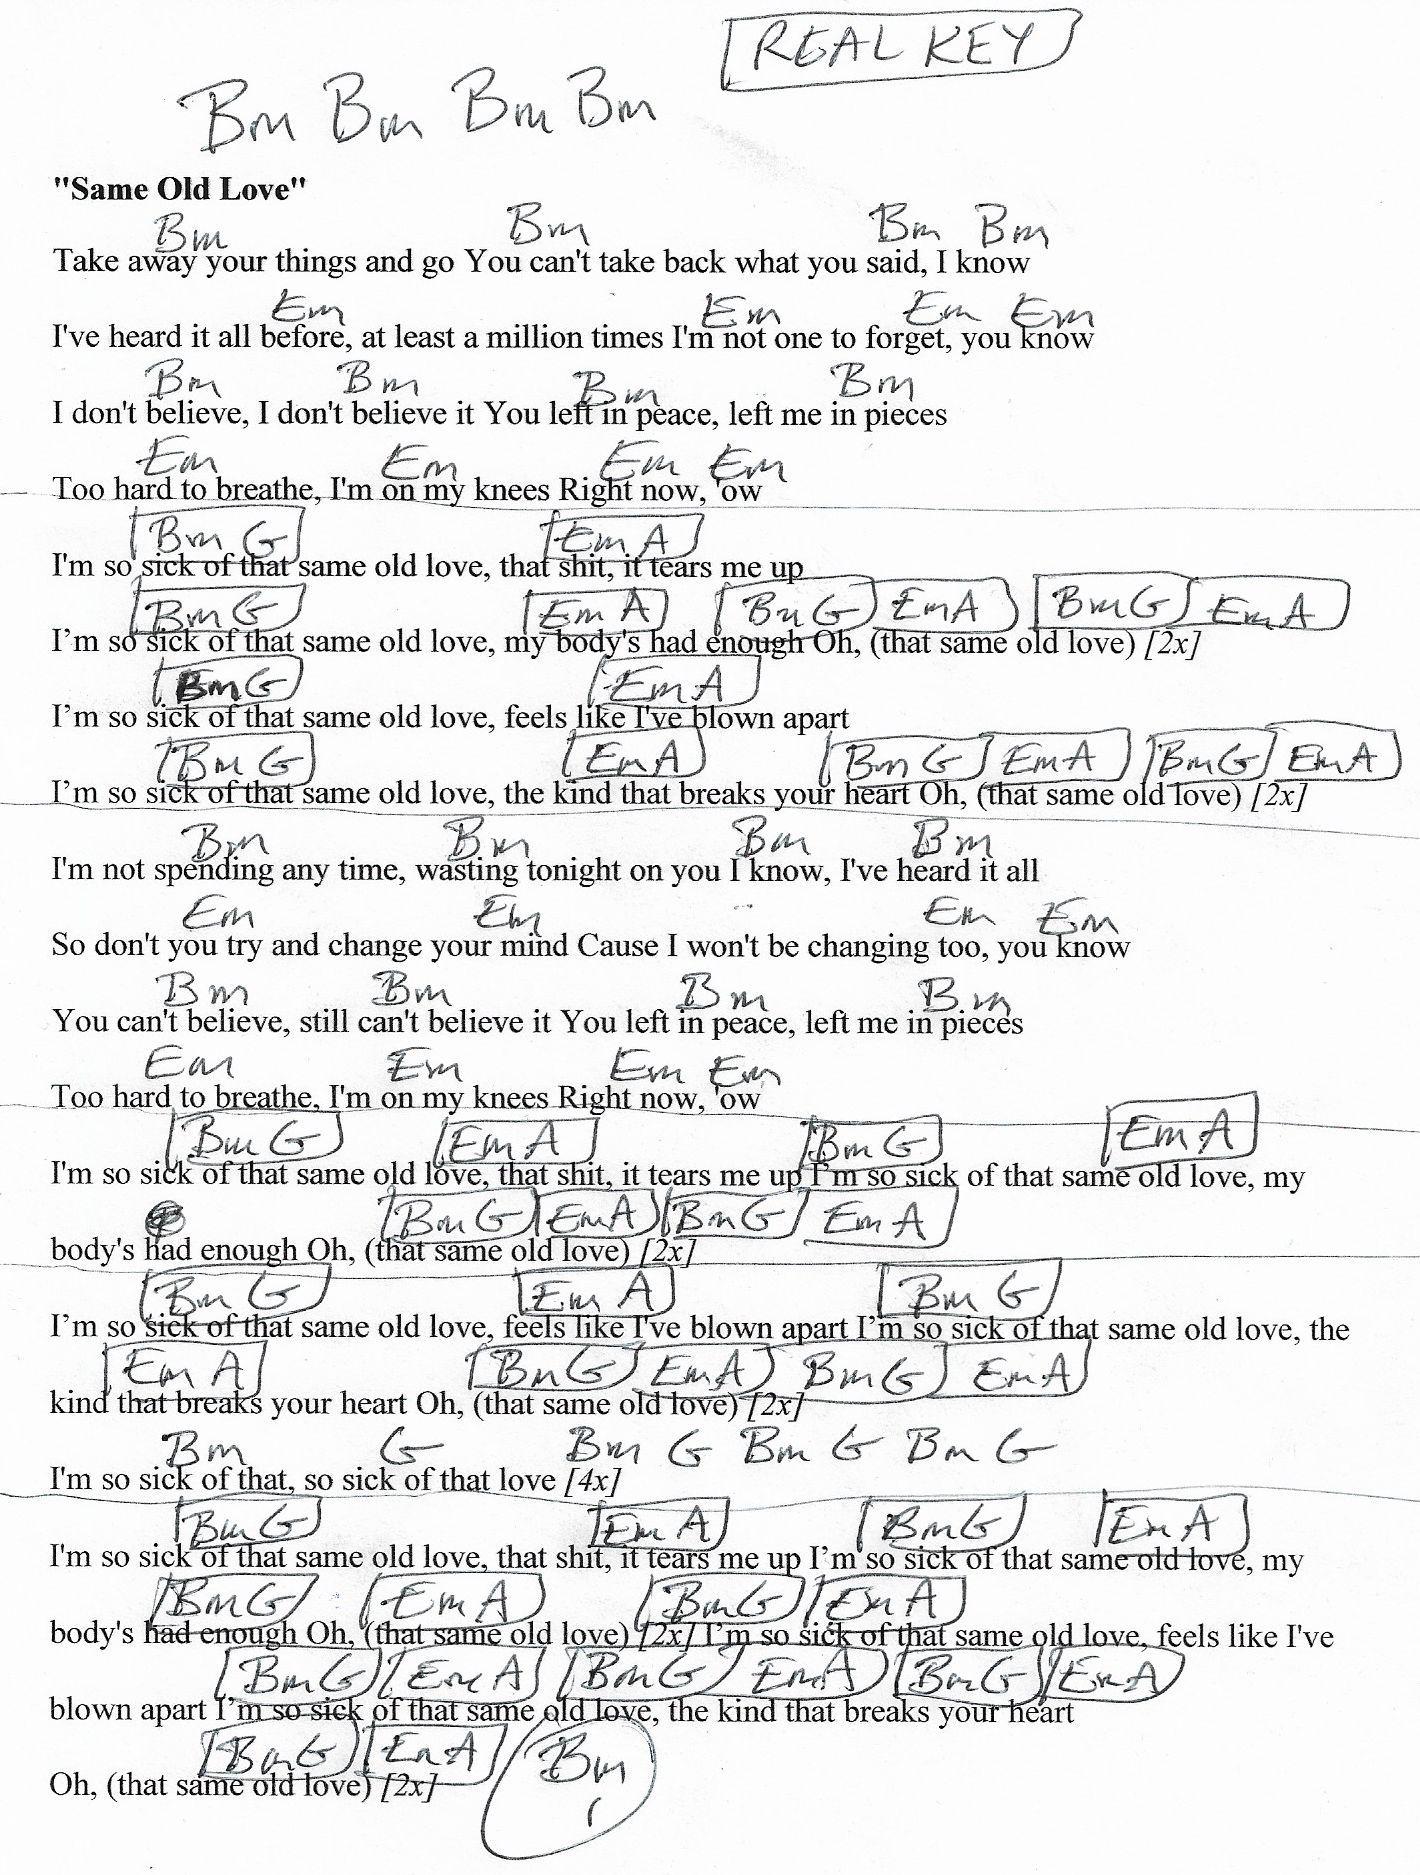 Same Old Love Selena Gomez Guitar Chord Chart in Bm REAL KEY